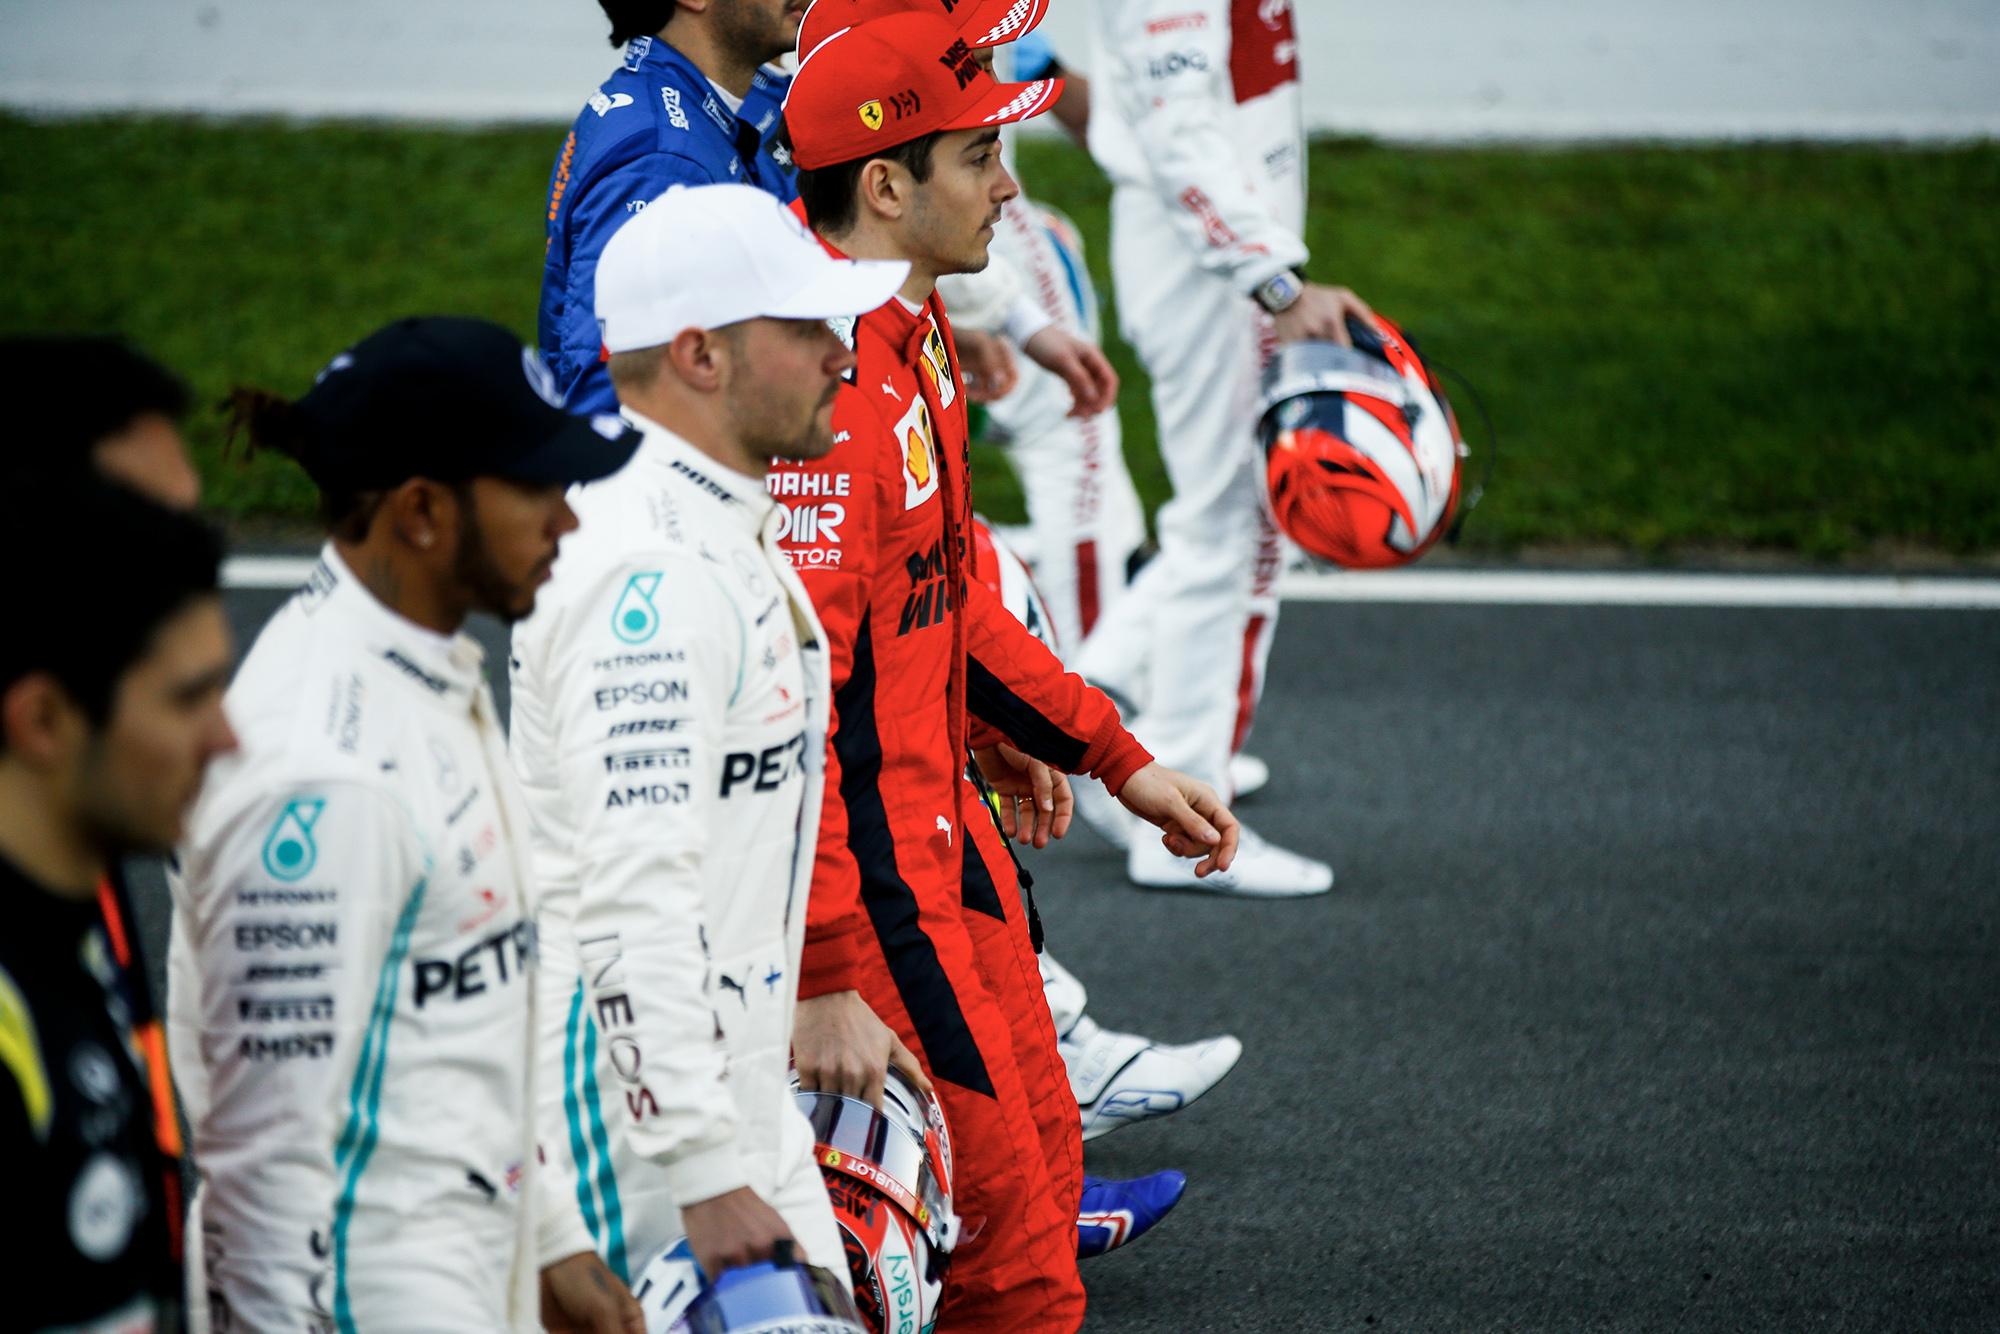 2020 F1 Barcelona pre-season test Day 1 drivers in a line